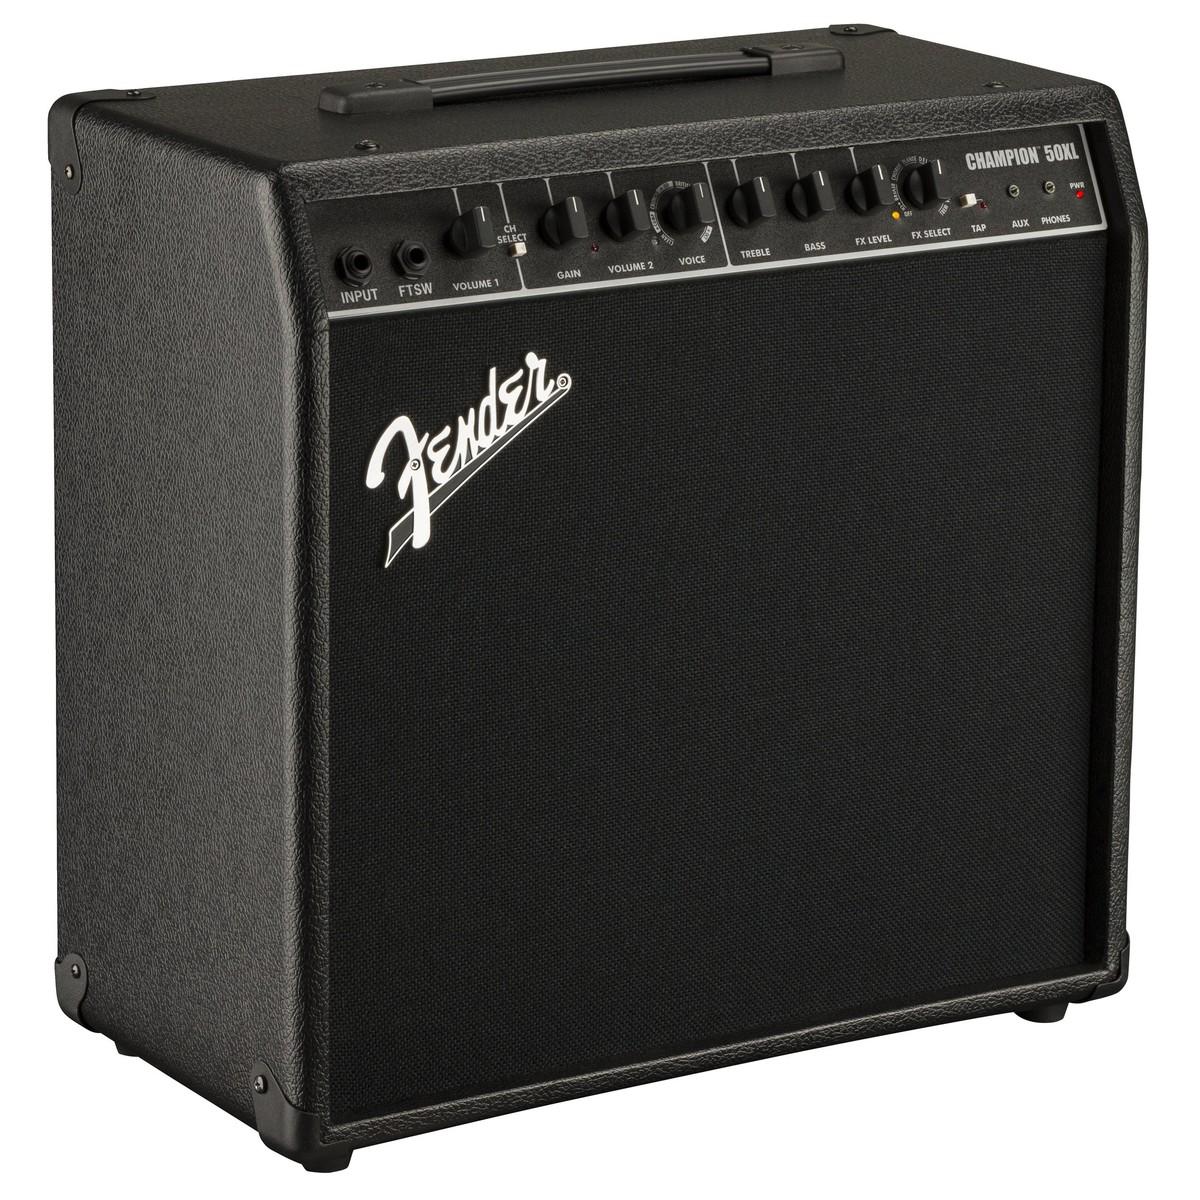 Fender Champion 50XL stiprintuvas elektrinei gitarai